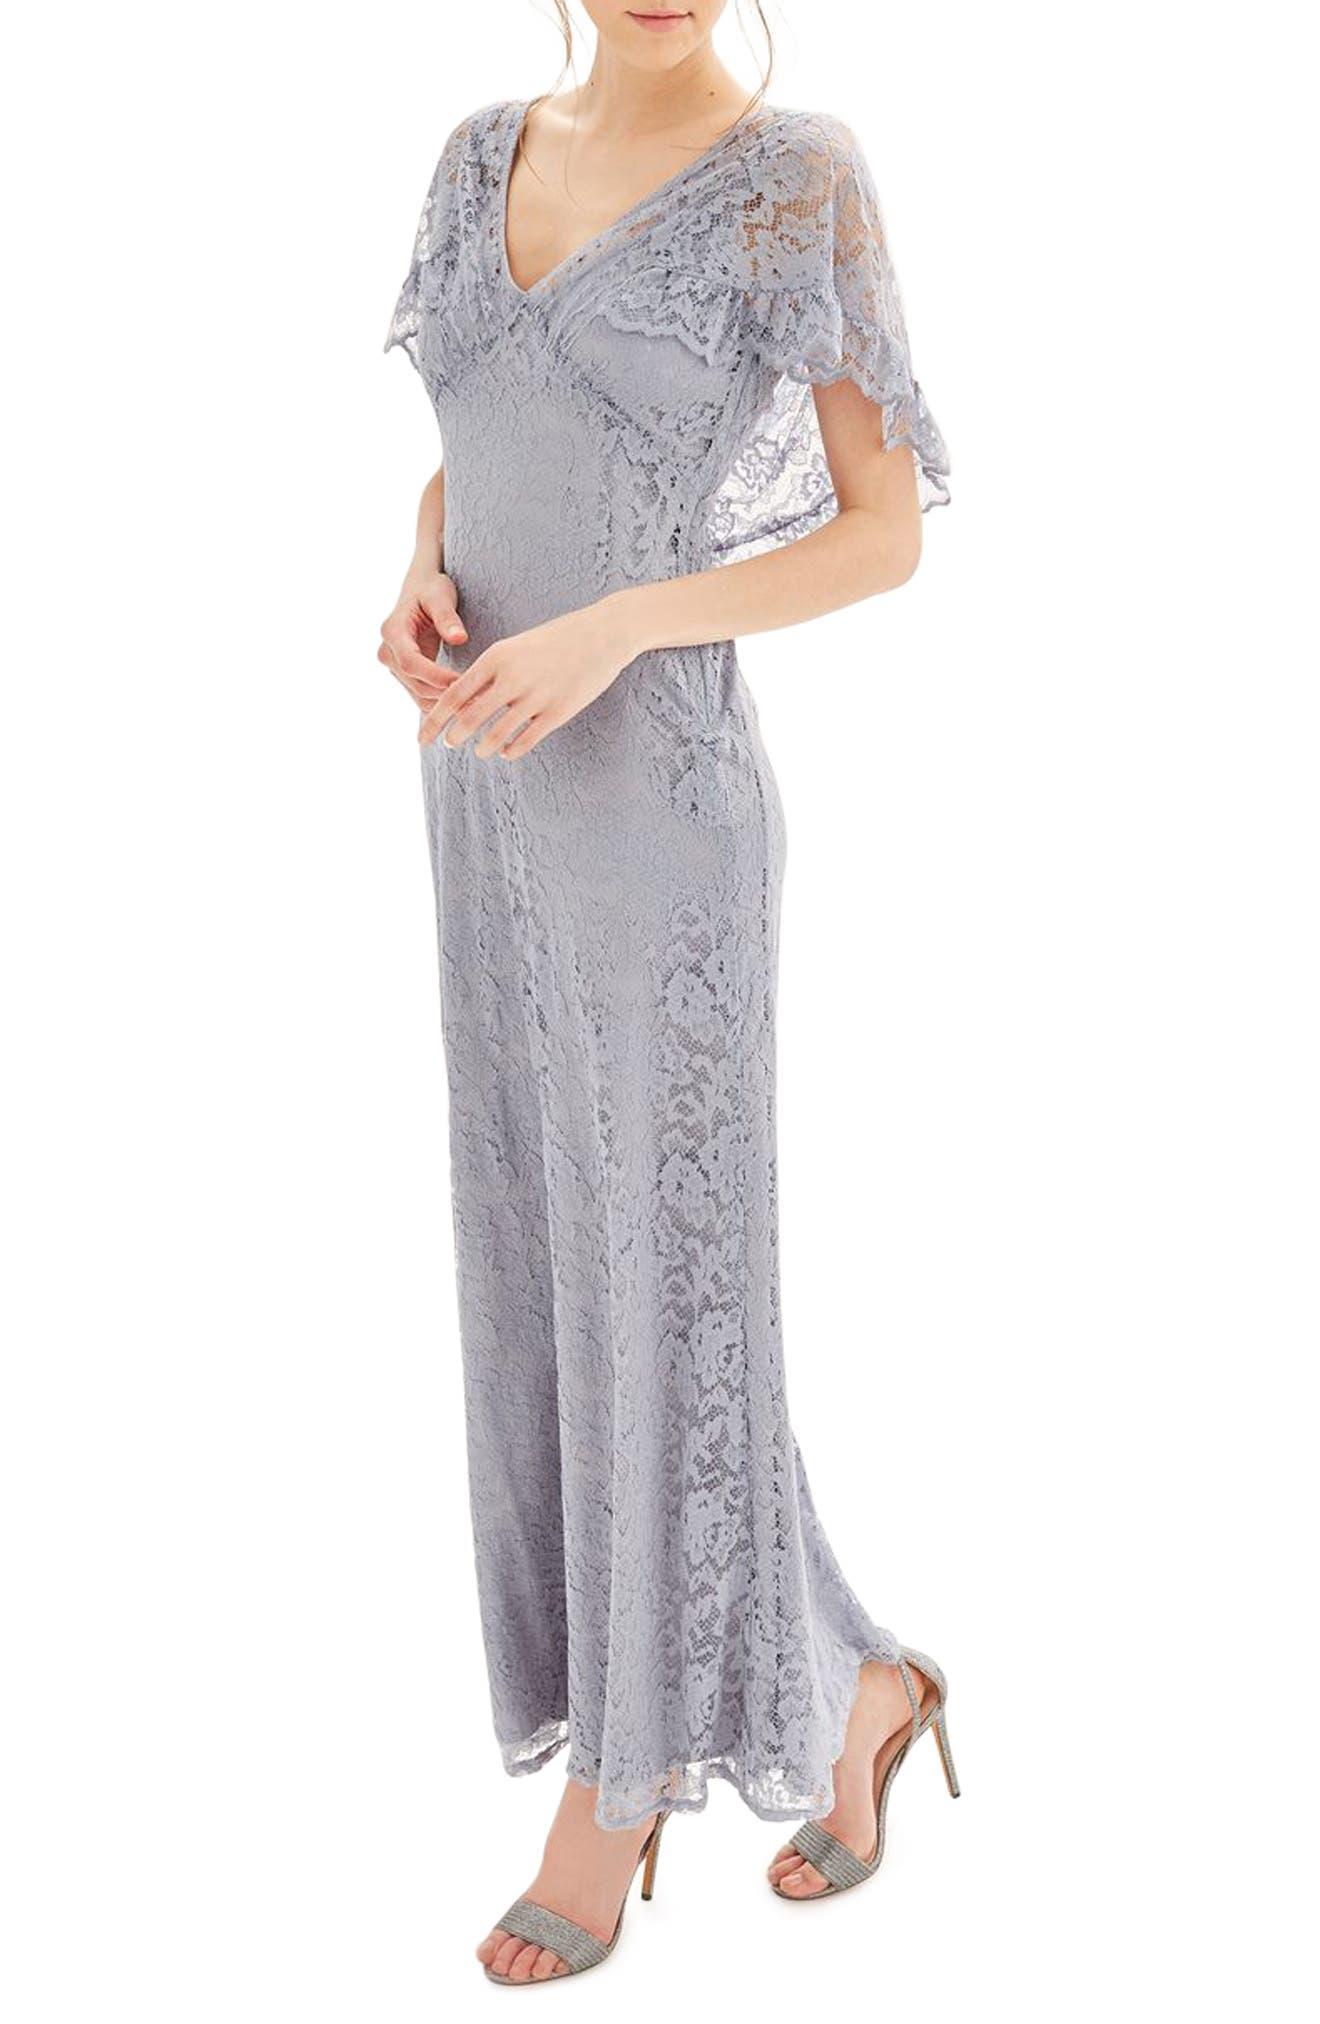 Topshop Bride Caped Gown